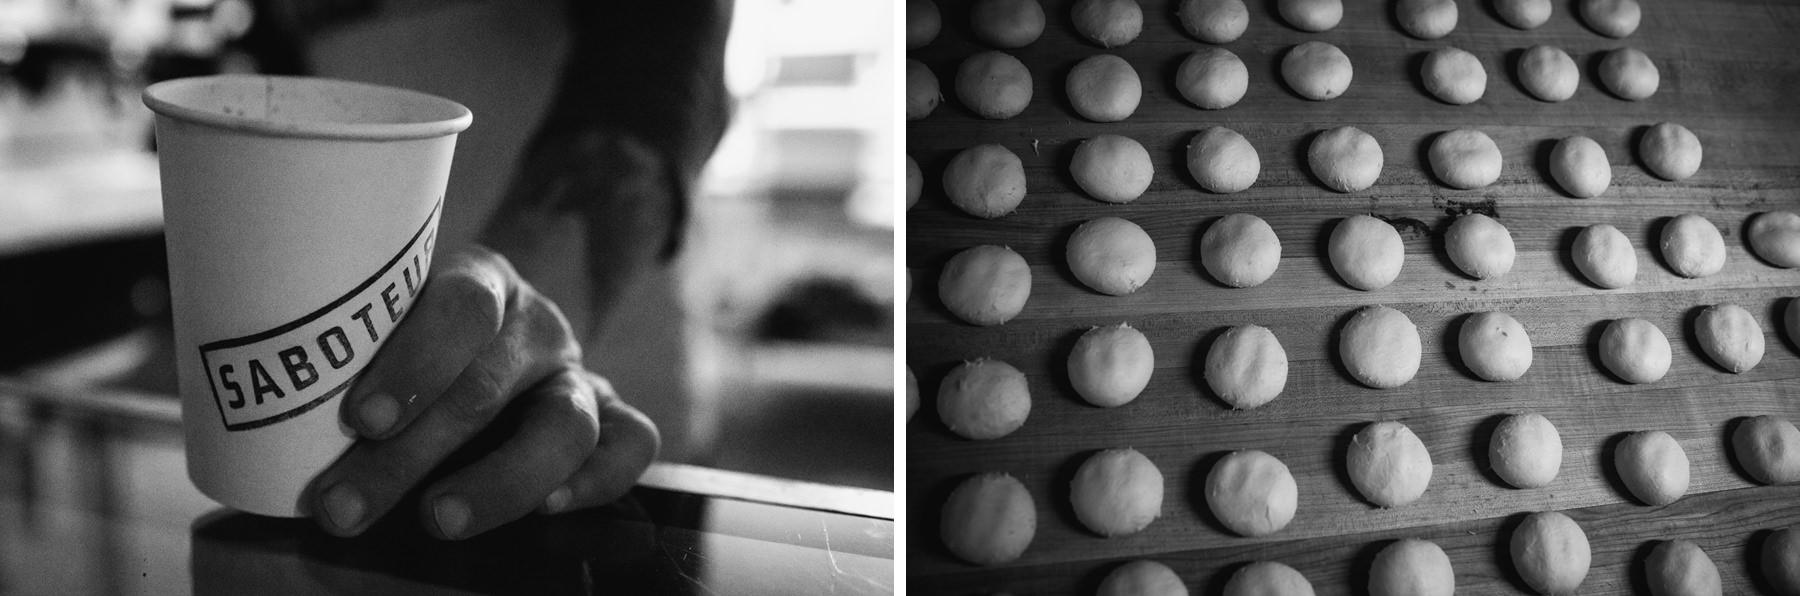 matt-tinder-saboteur-bakery-bremerton-wa-14